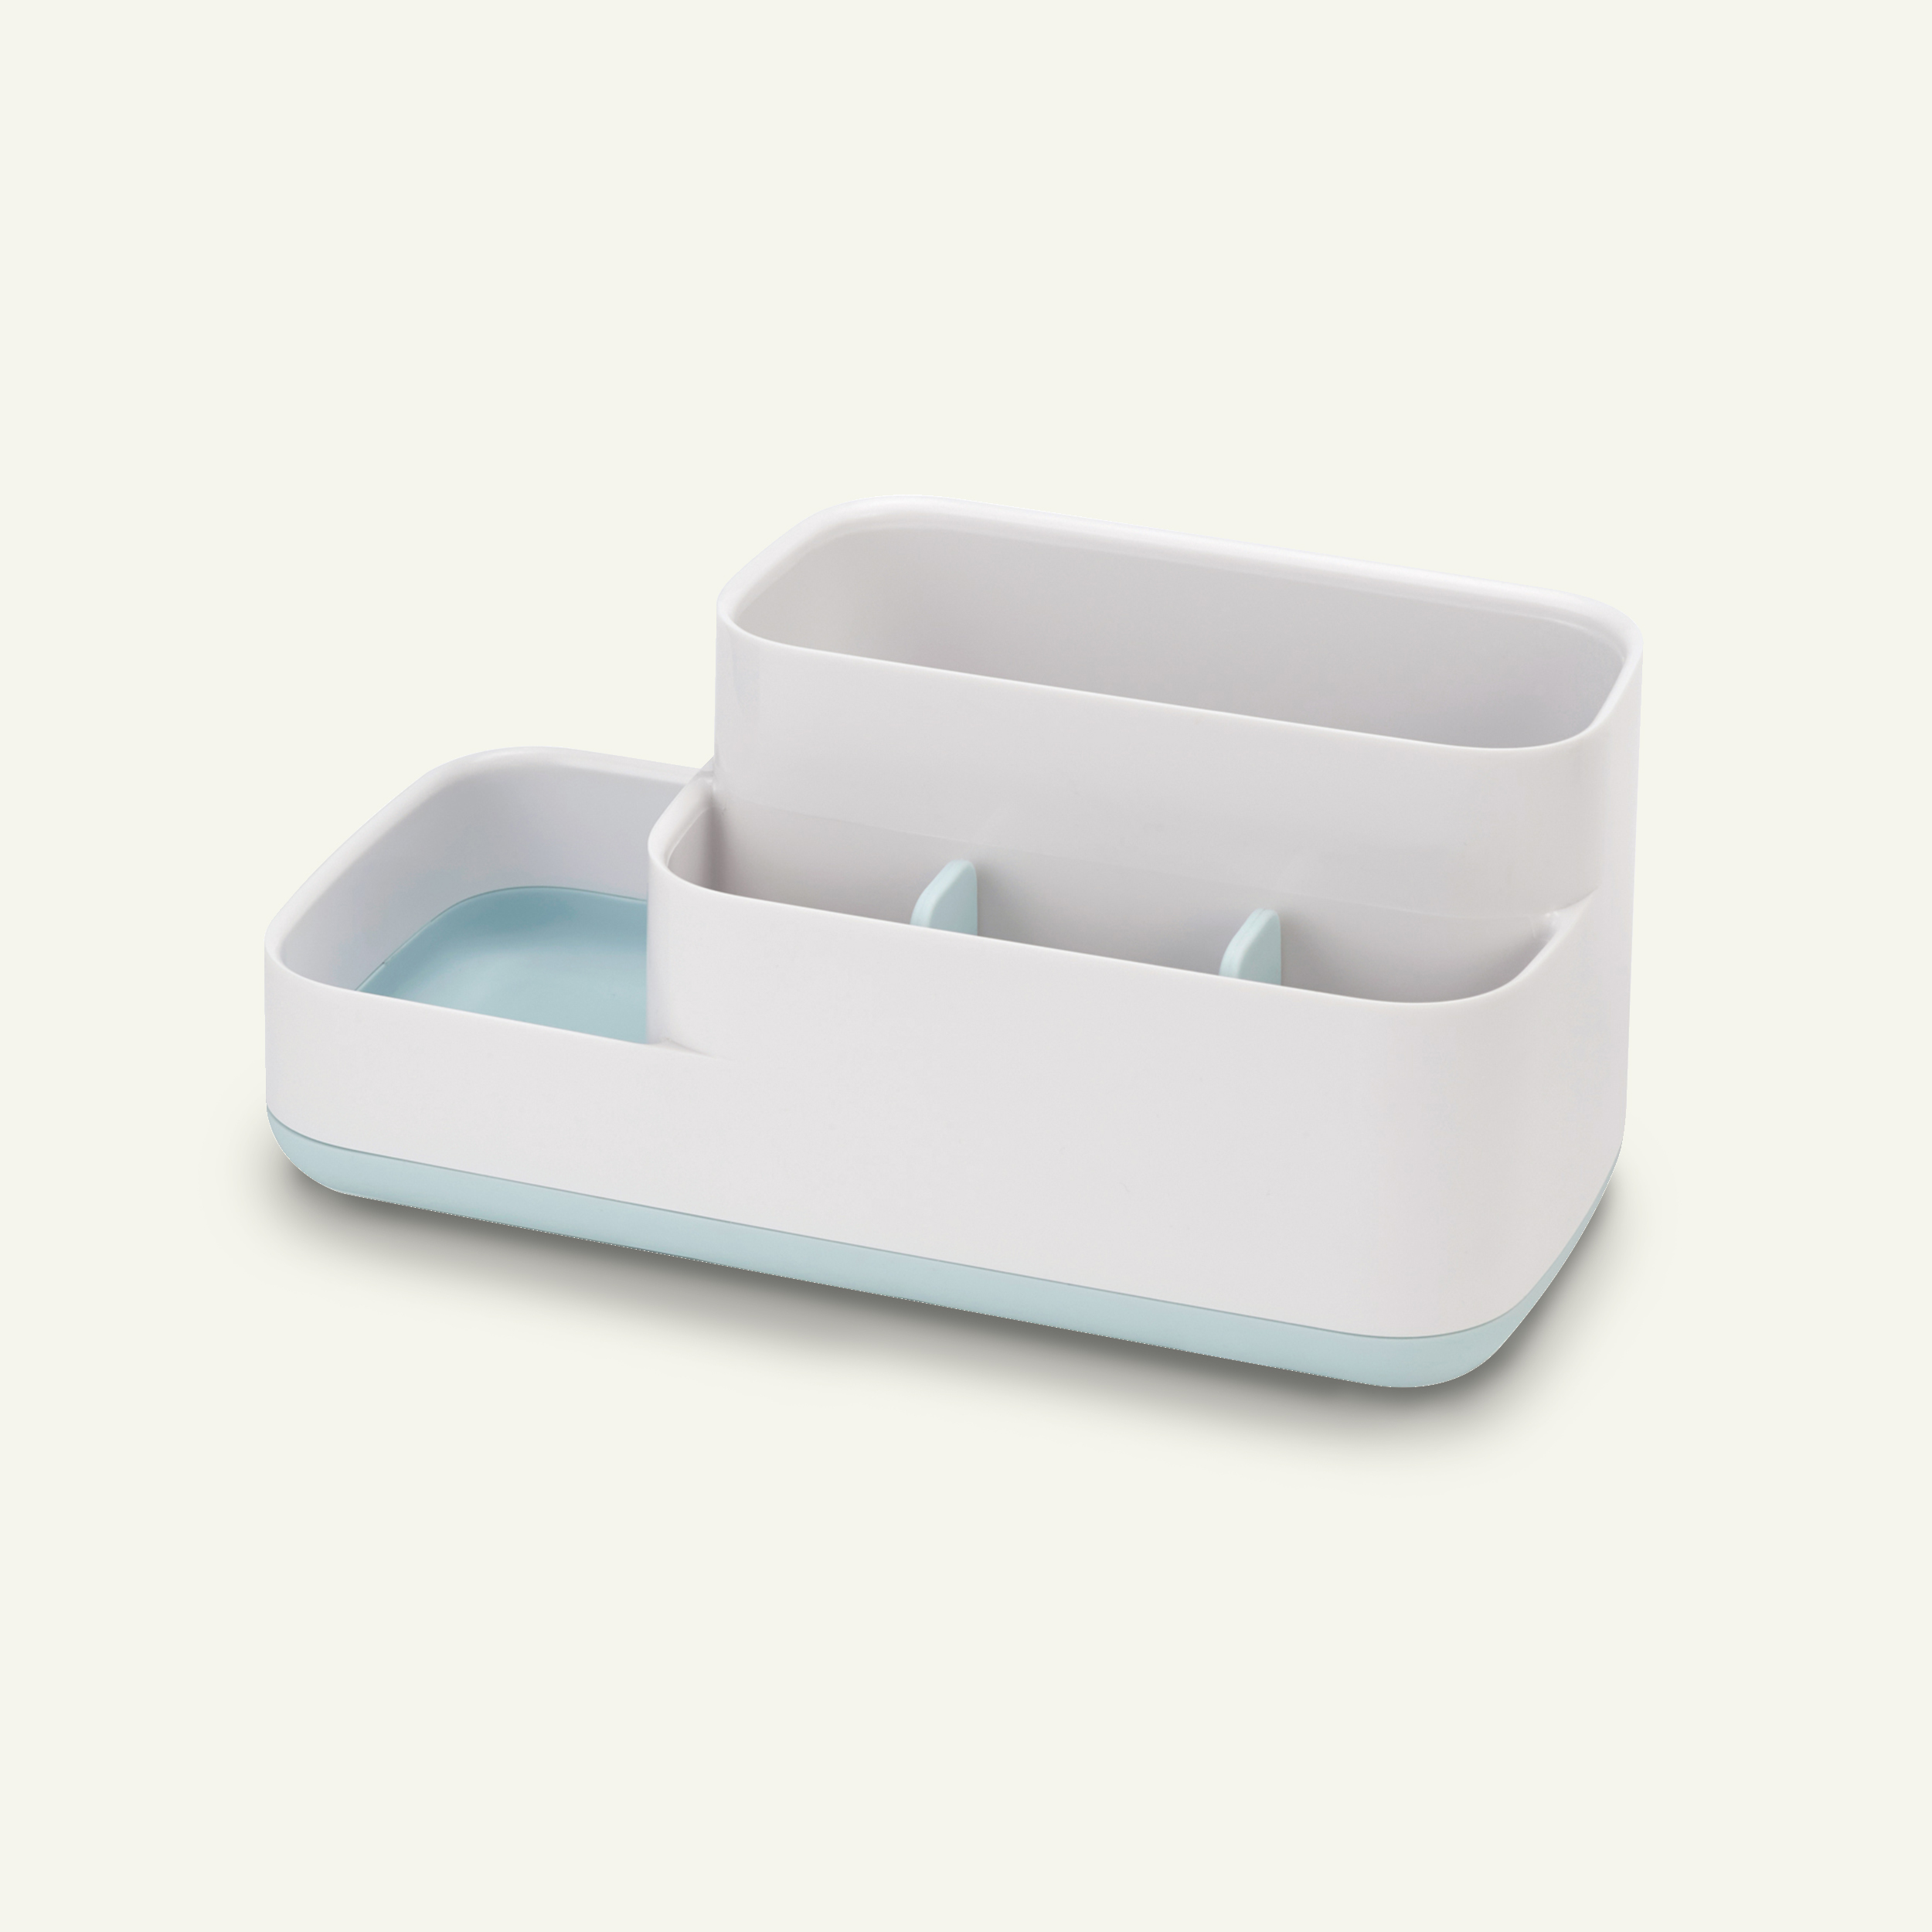 Studio Wood - JJ Bathroom Caddy Product Design 02